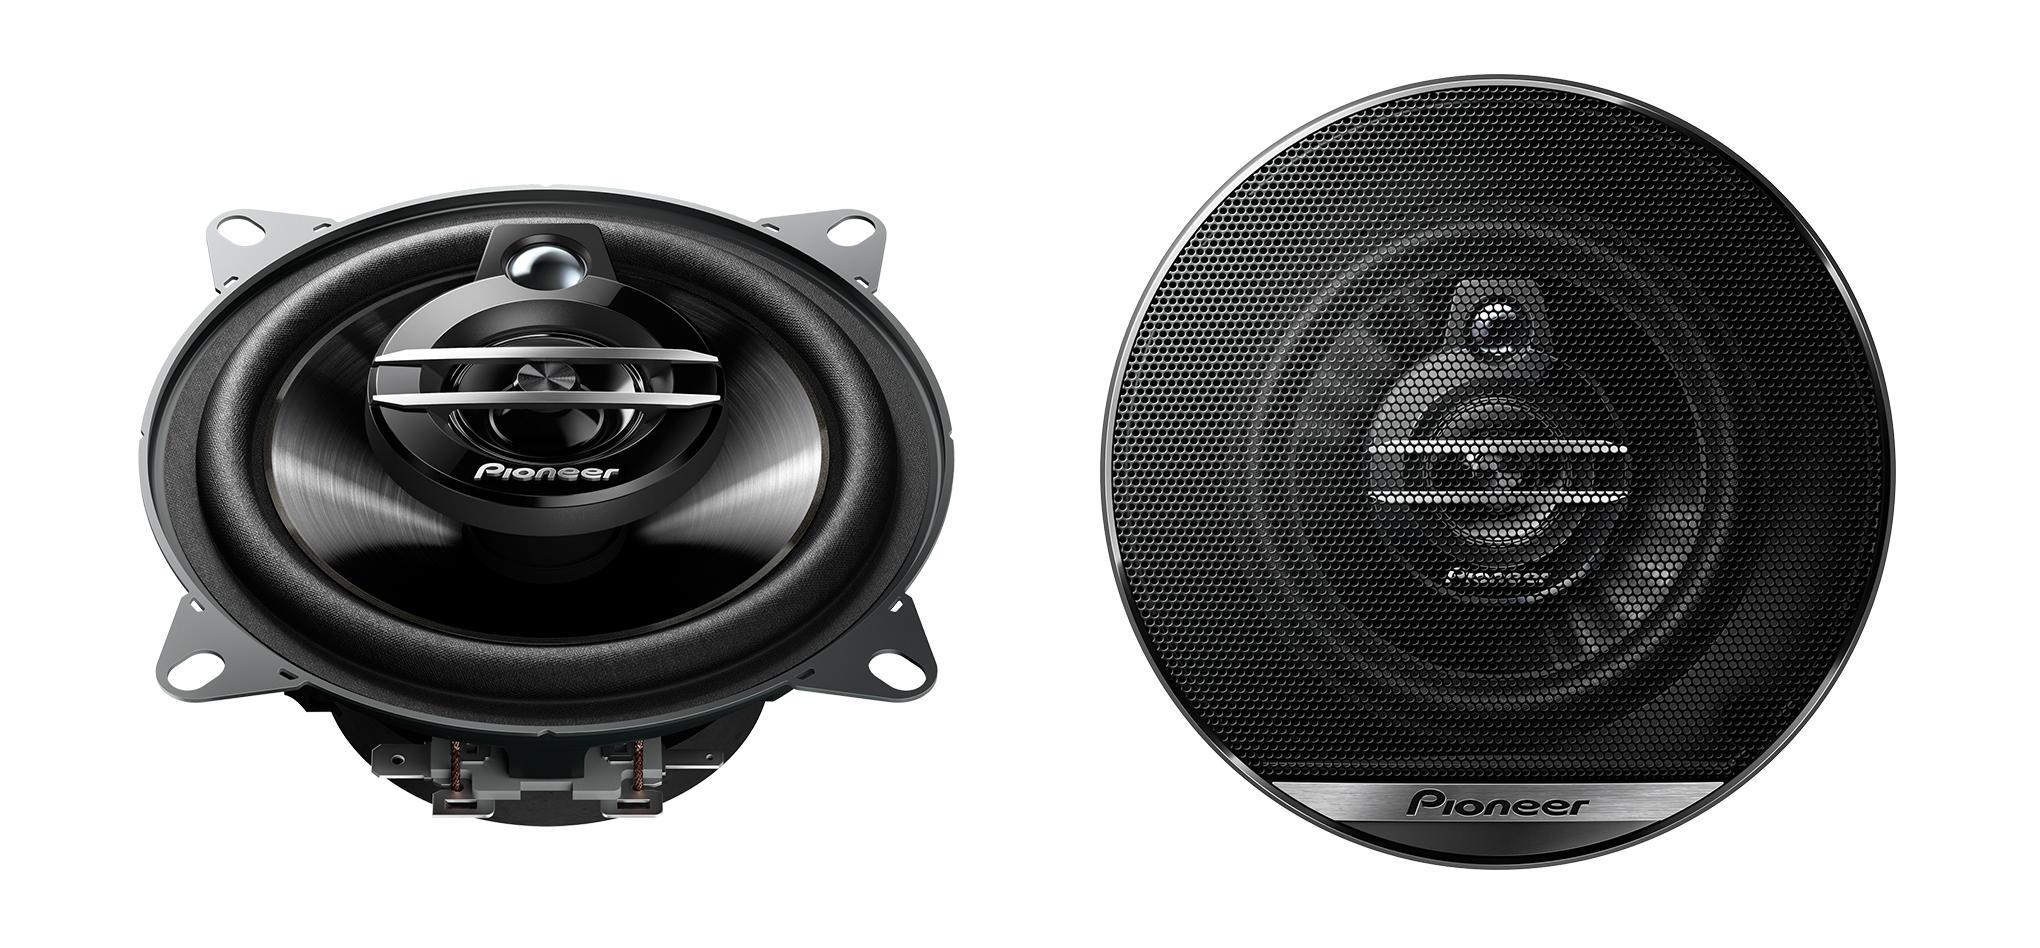 Haut-parleurs TS-G1030F PIONEER TS-G1030F originales de qualité